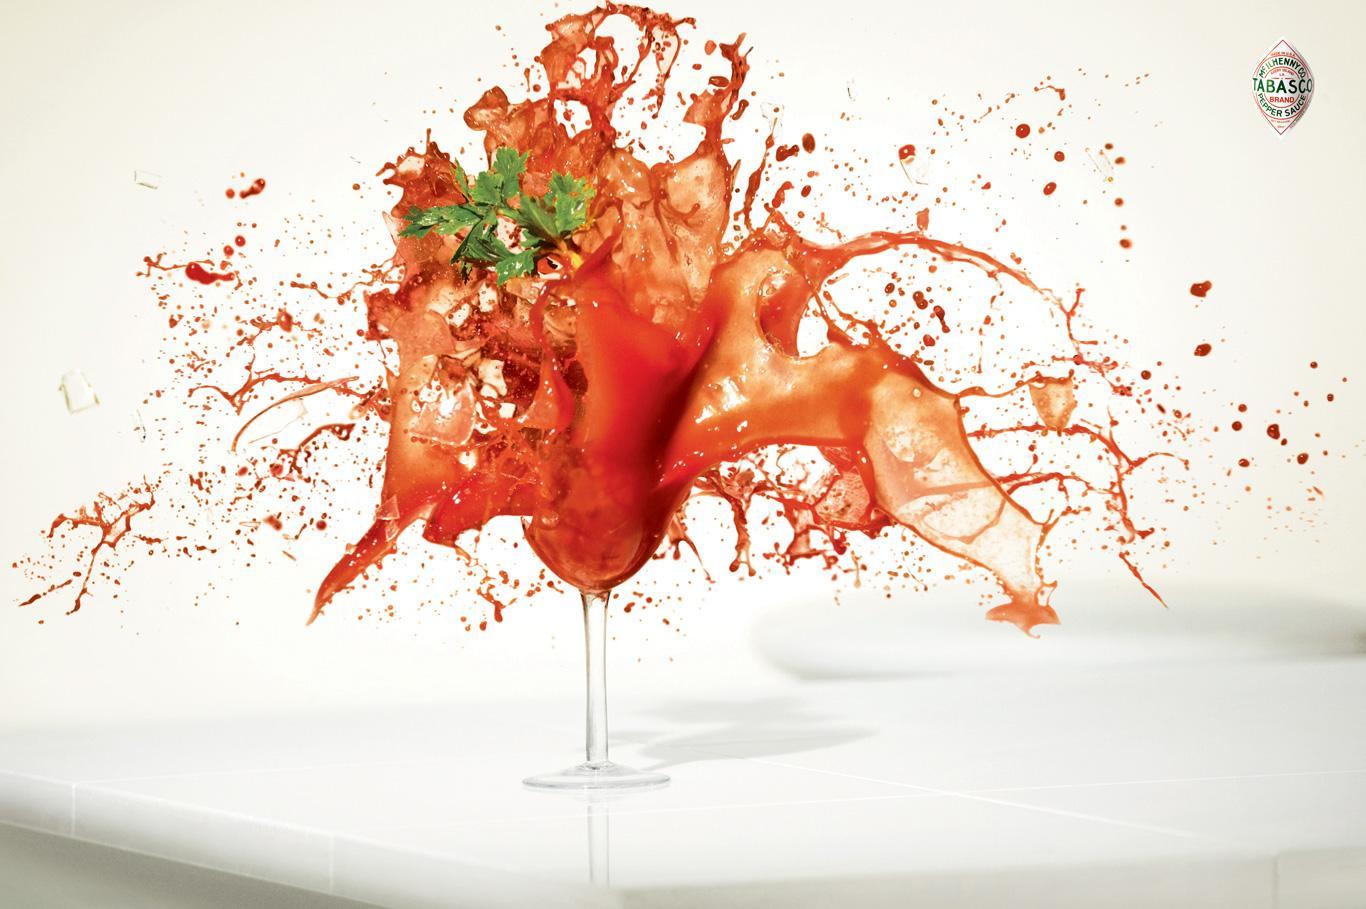 Tomato Sauce Stain Remover